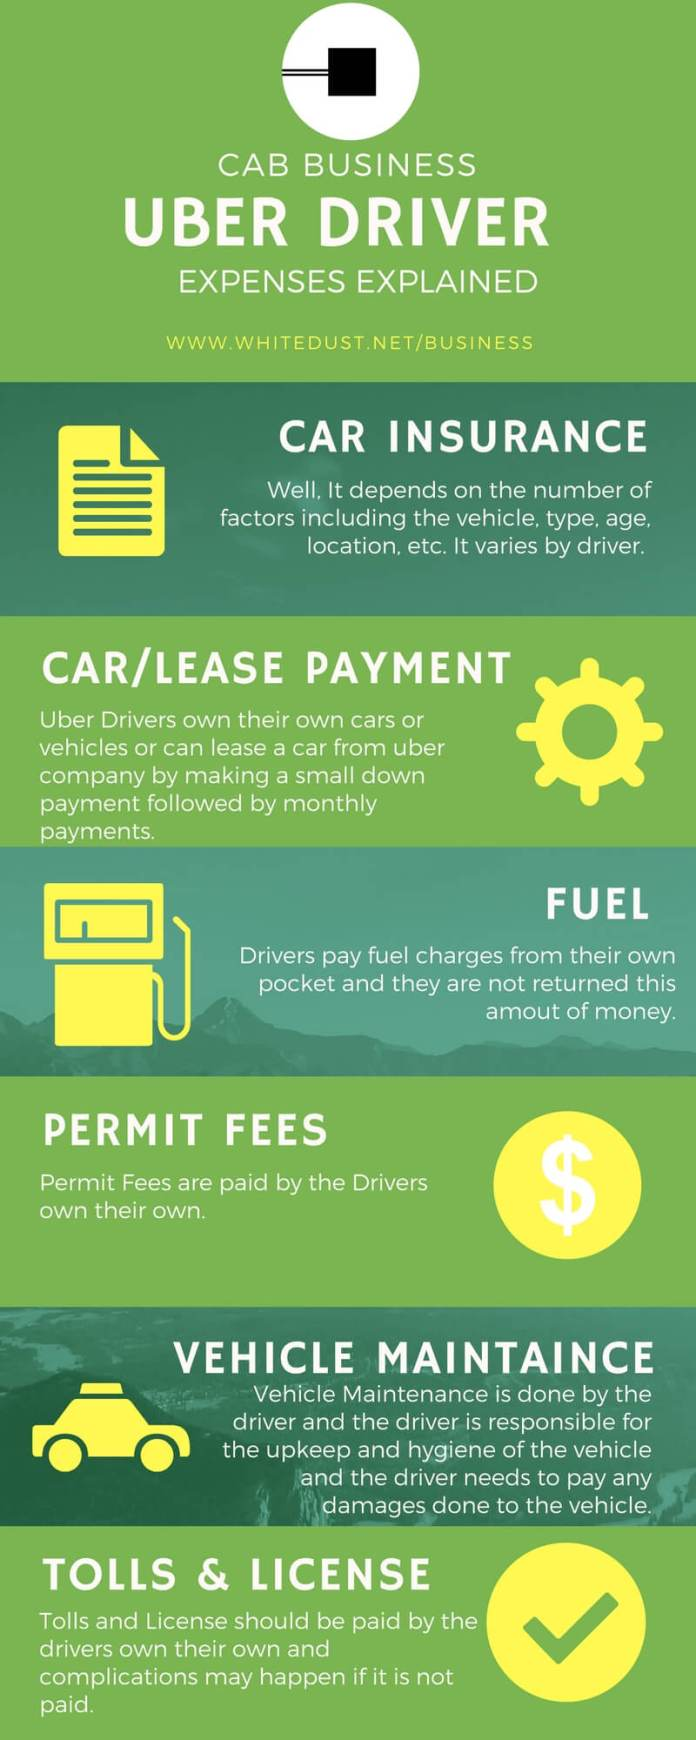 uber's driver expenses